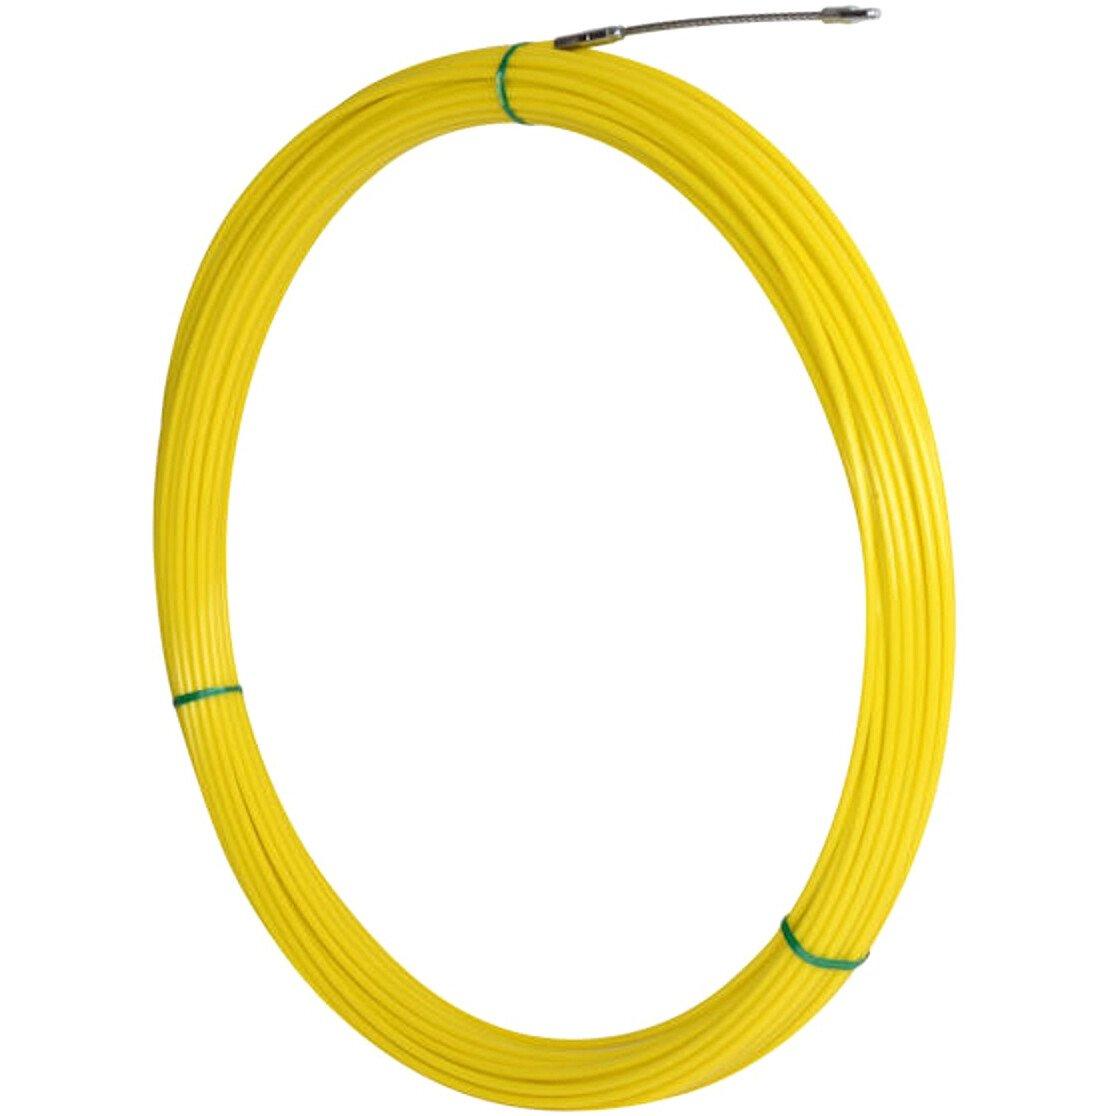 CK 495055 Steel Core Wire Draw Tape 50m